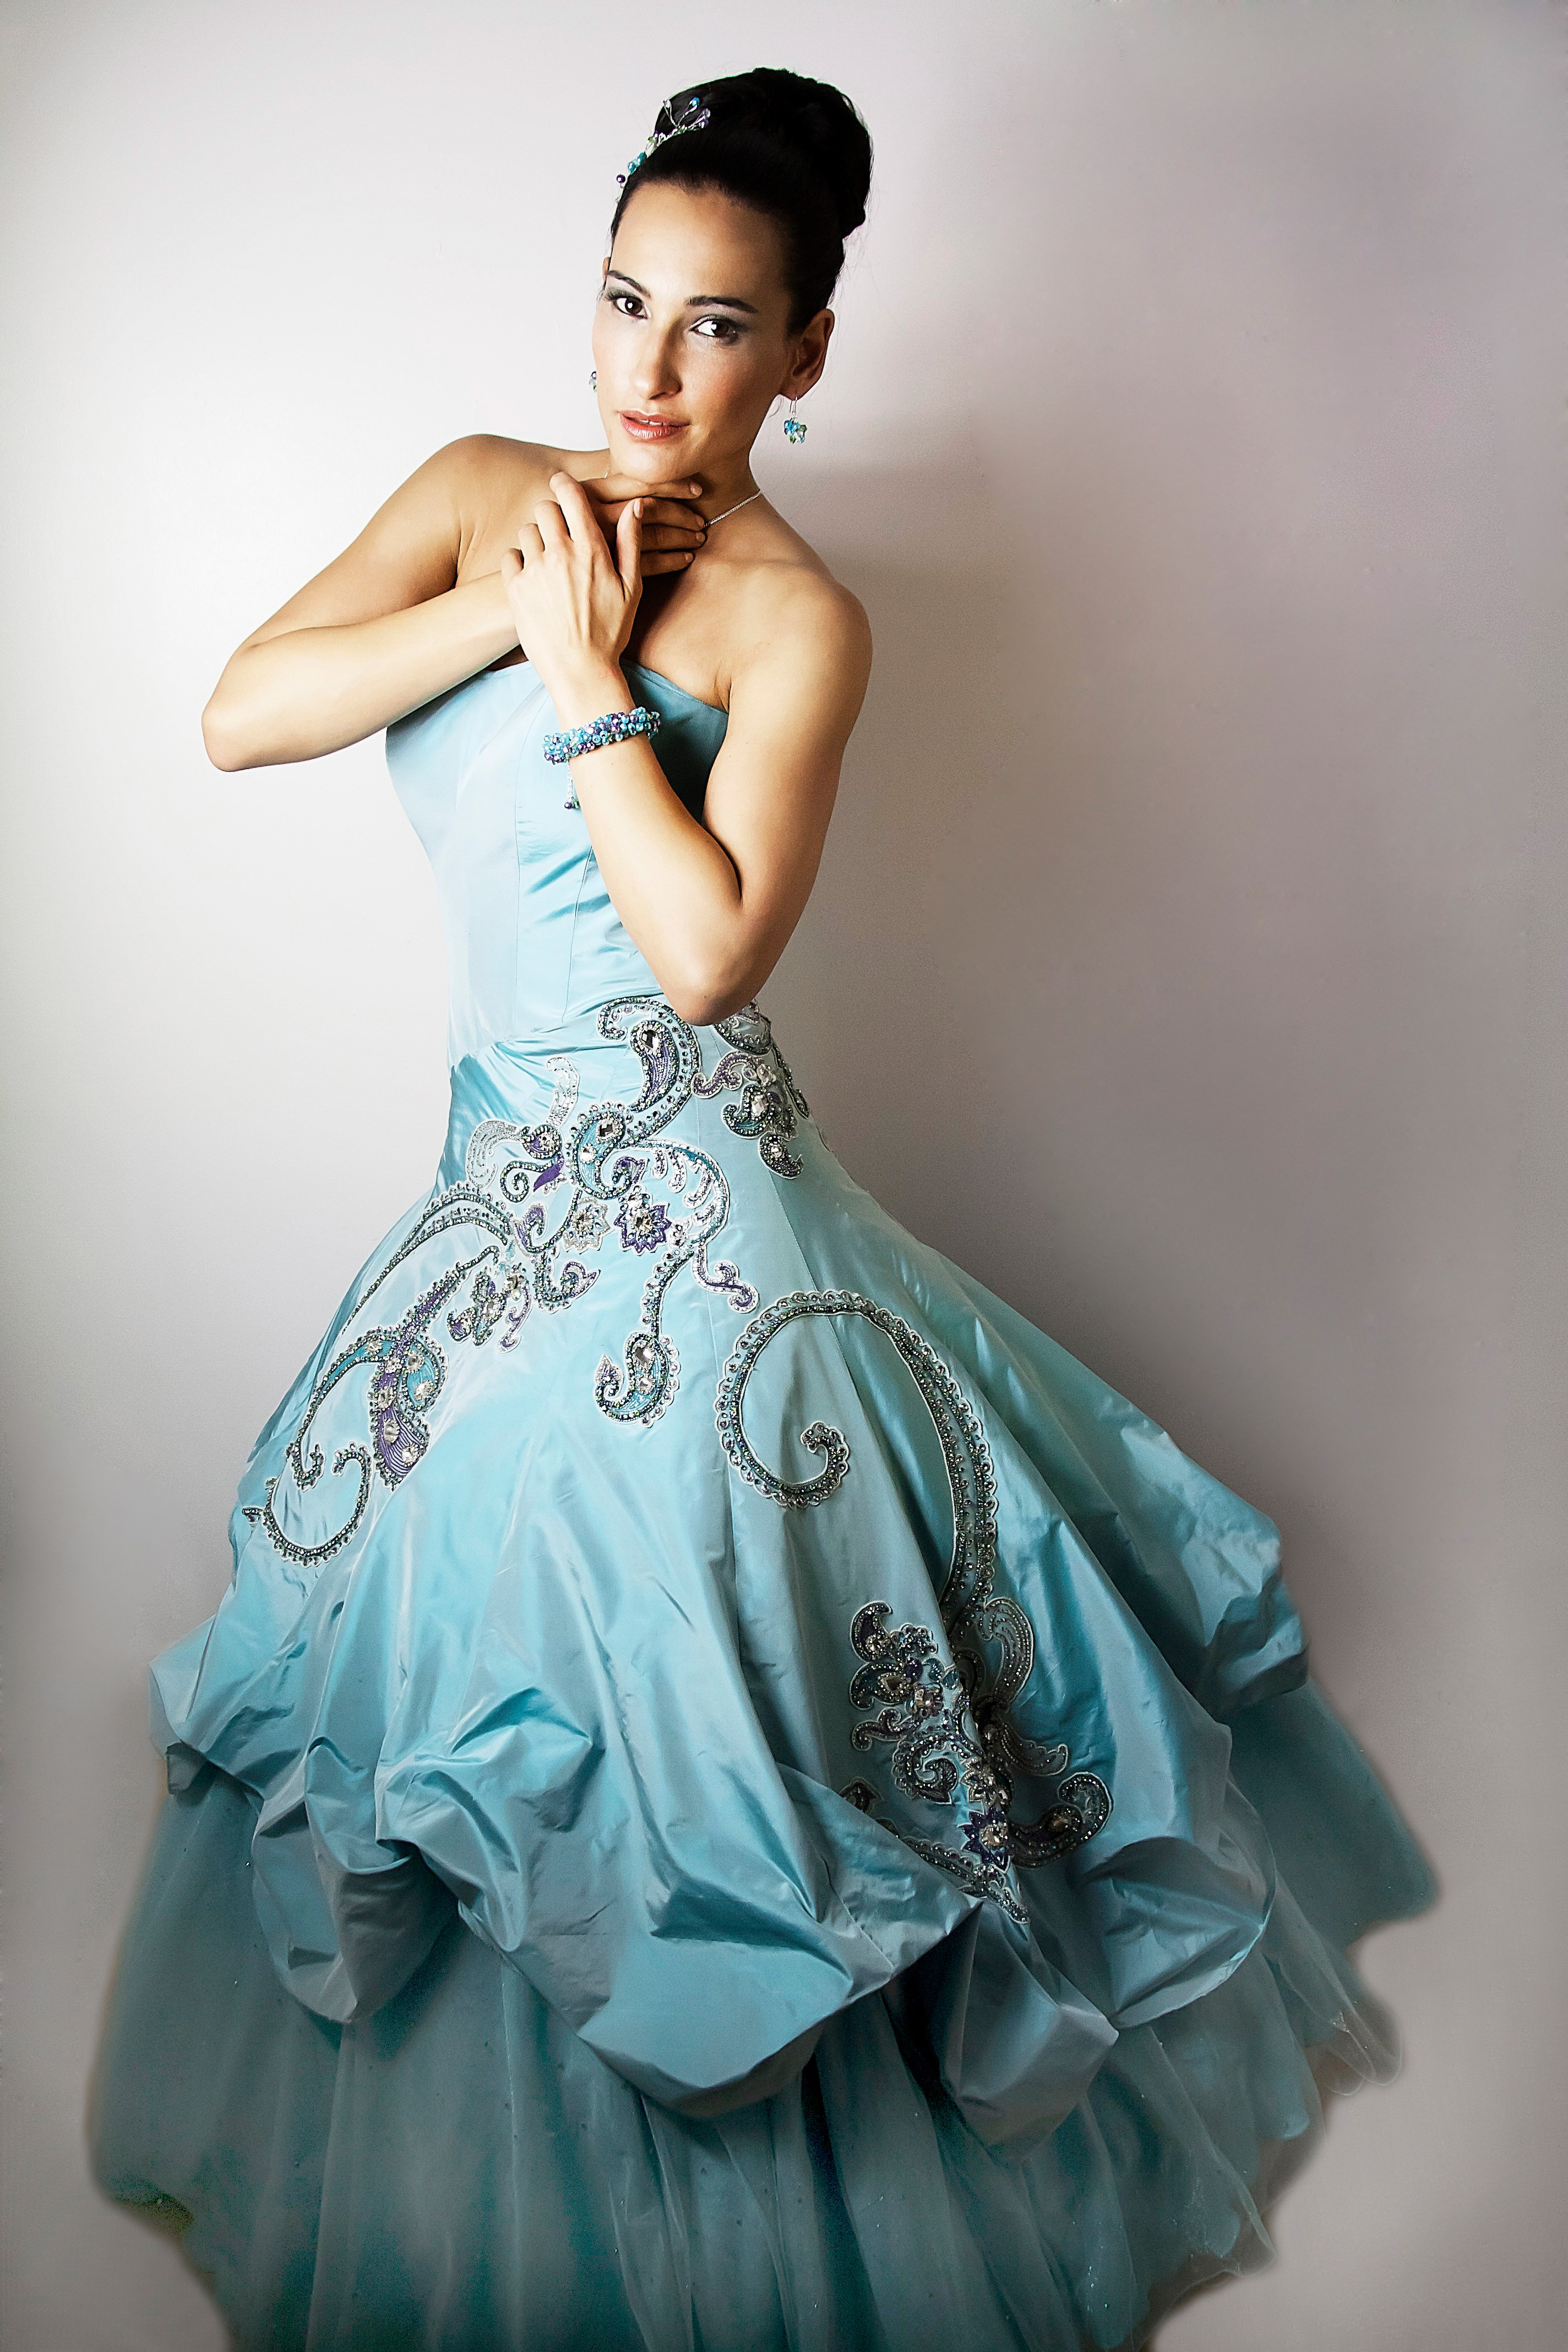 42_dress12_MG_4253